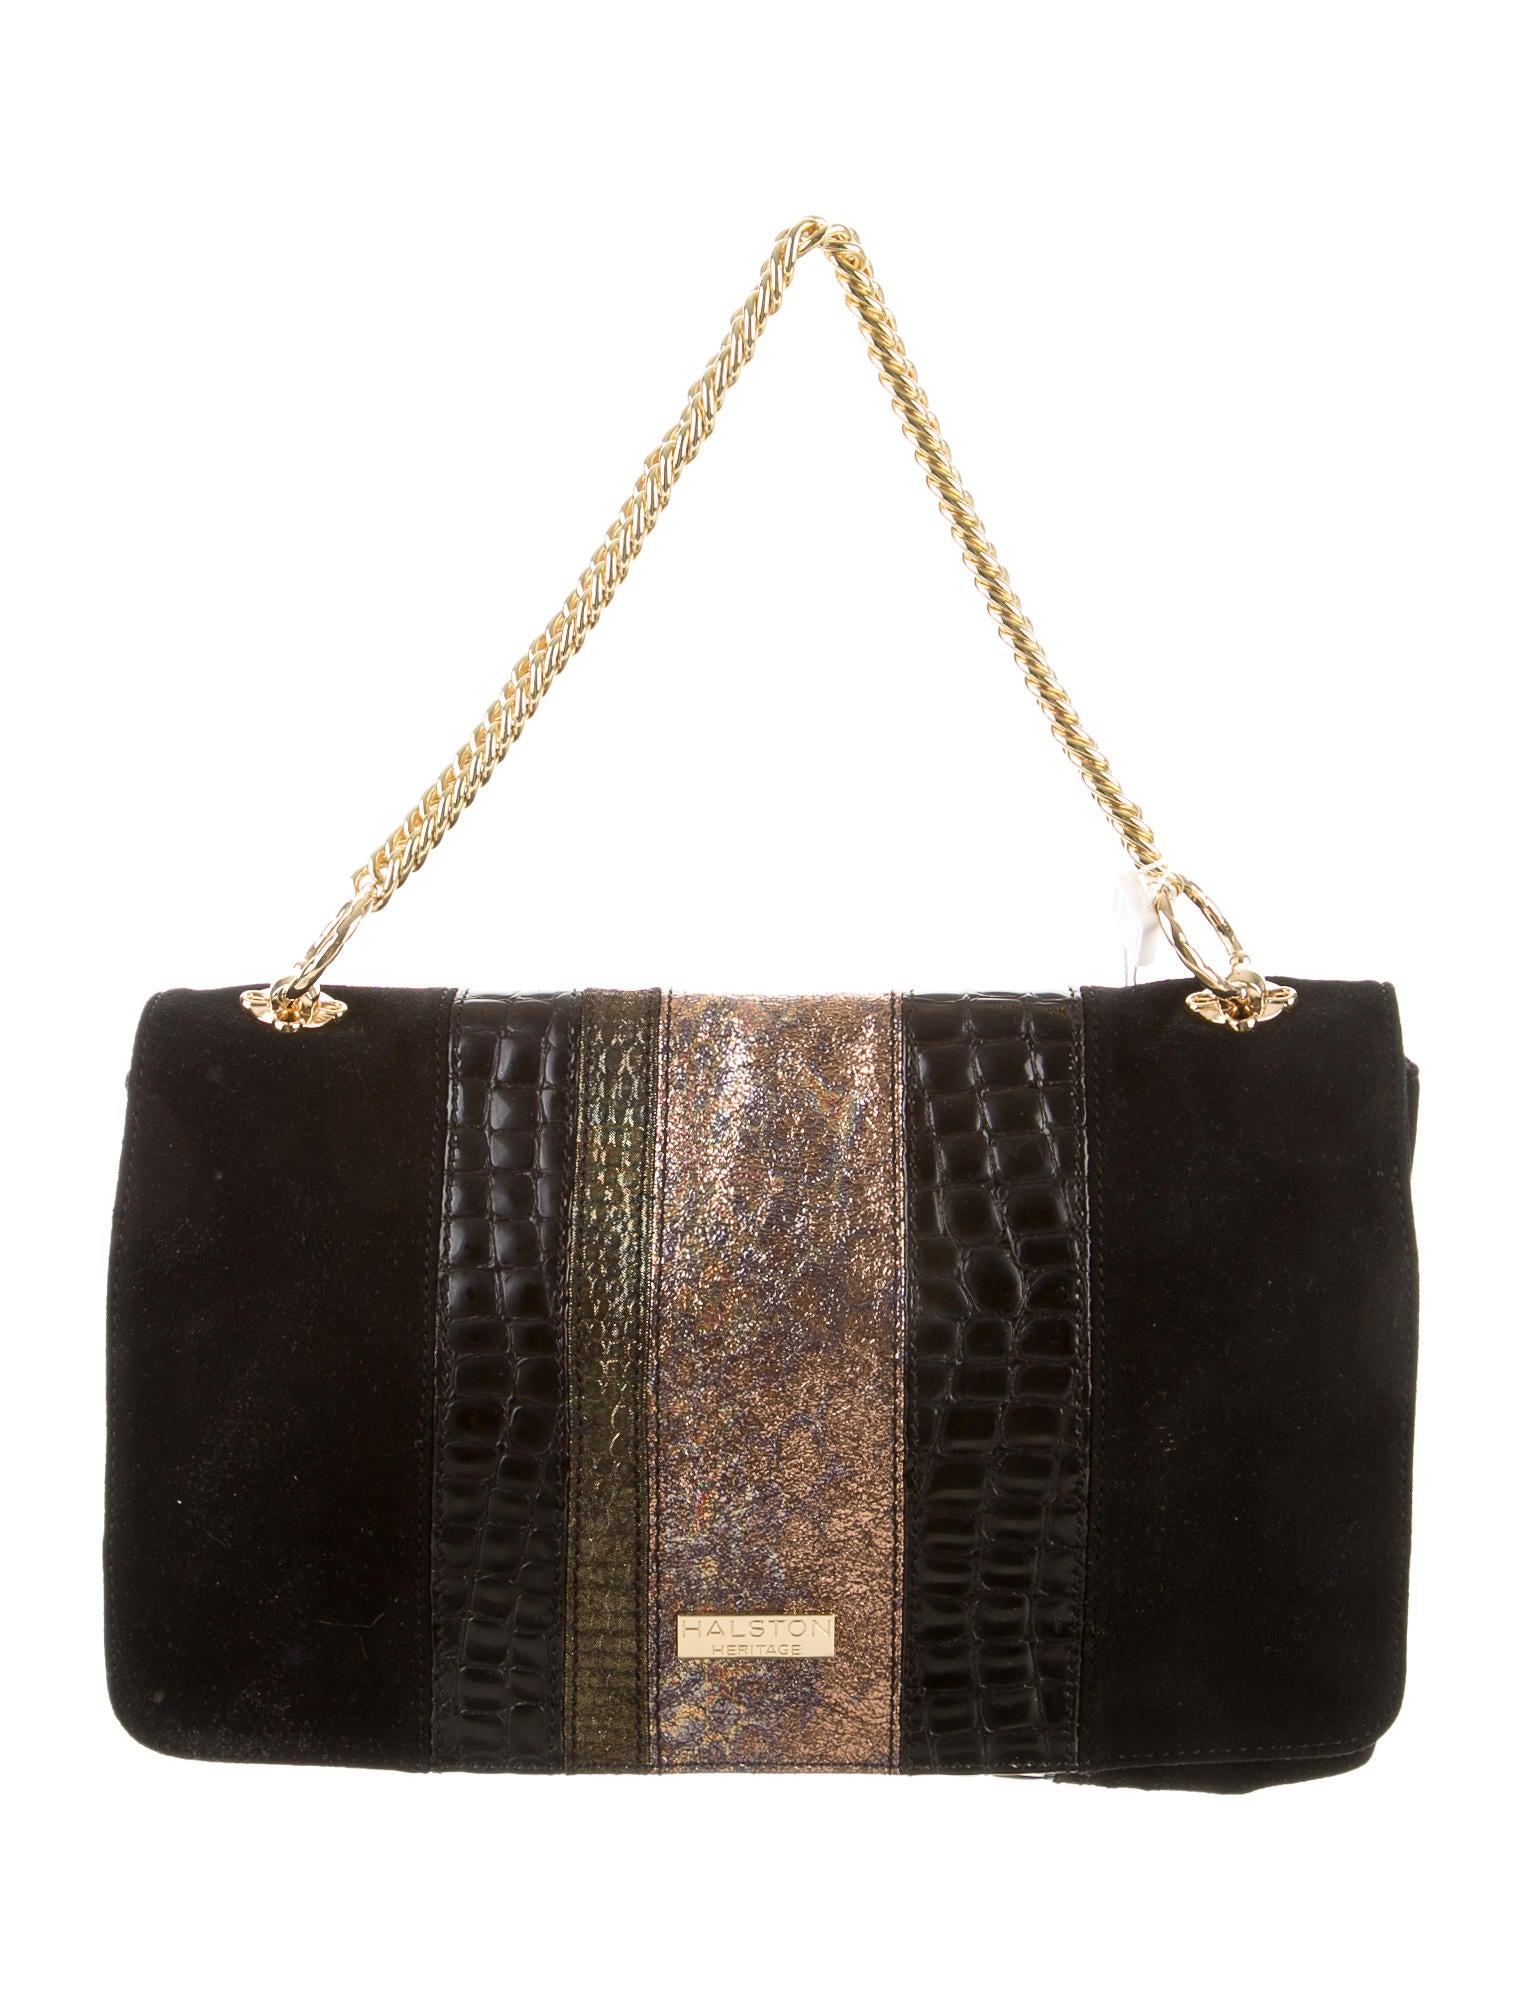 5cfc51cc7066 Halston Heritage Embossed Shoulder Bag w  Tags - Handbags - WH122119 ...